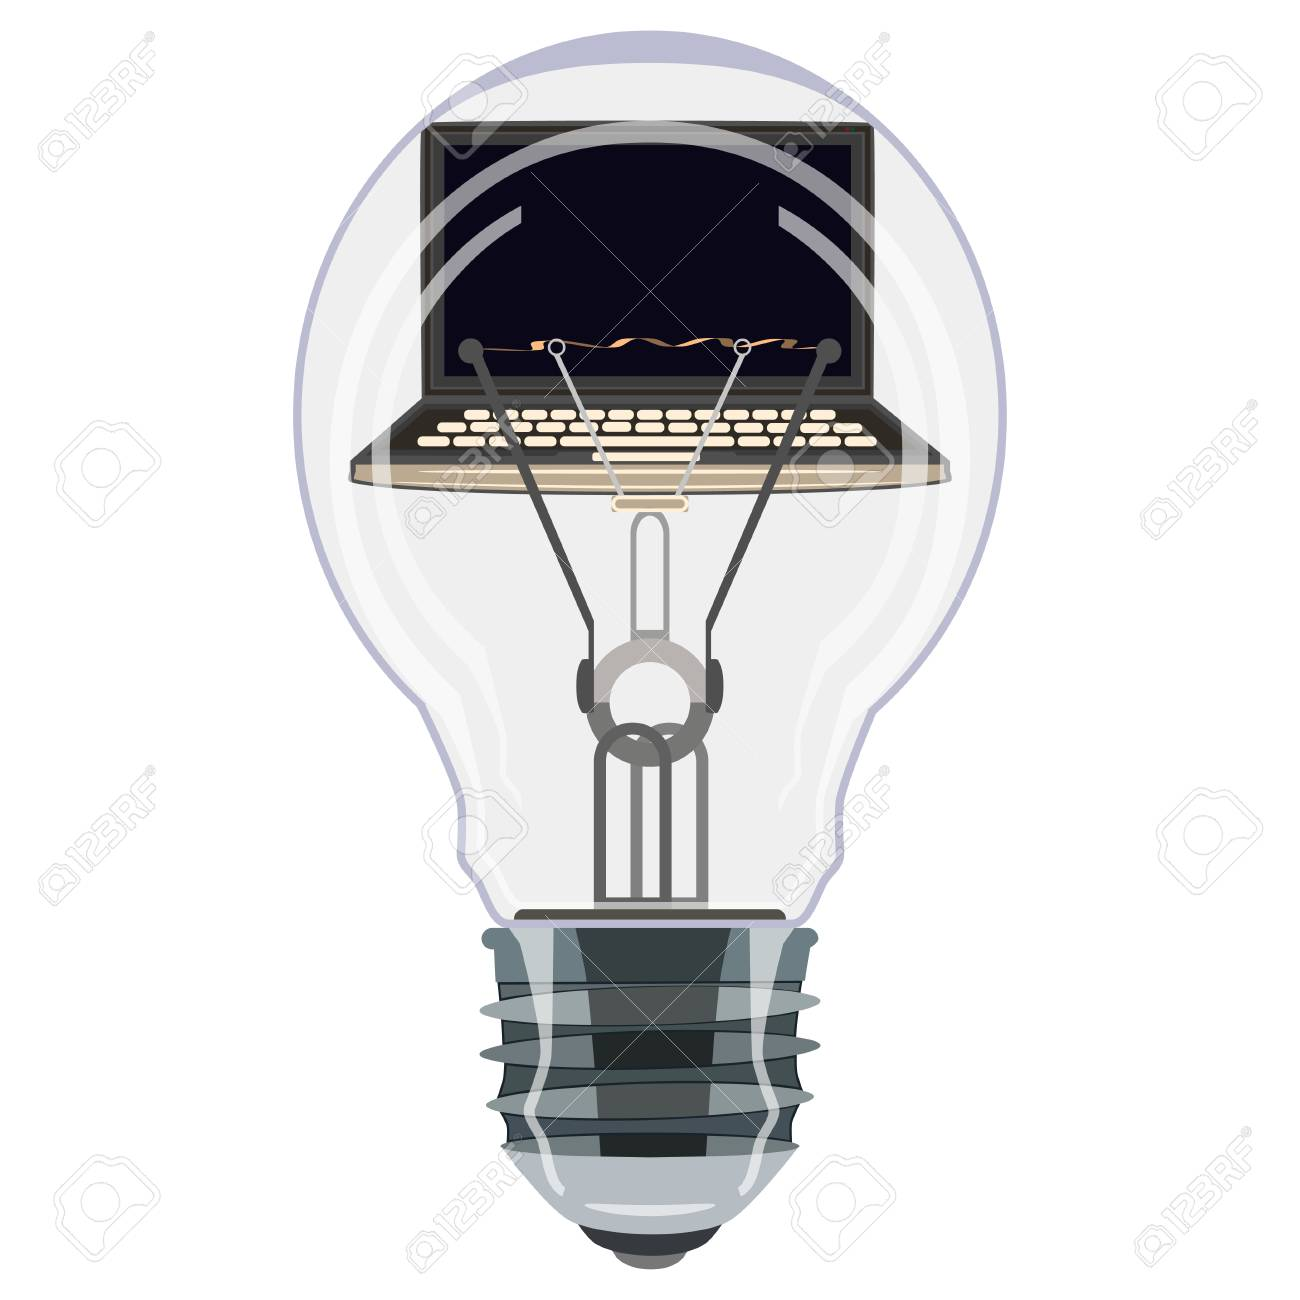 Wonderful Laptop Inside Of Light Bulb Vector Illustration. Creative Idea, Software  Development, Computer And